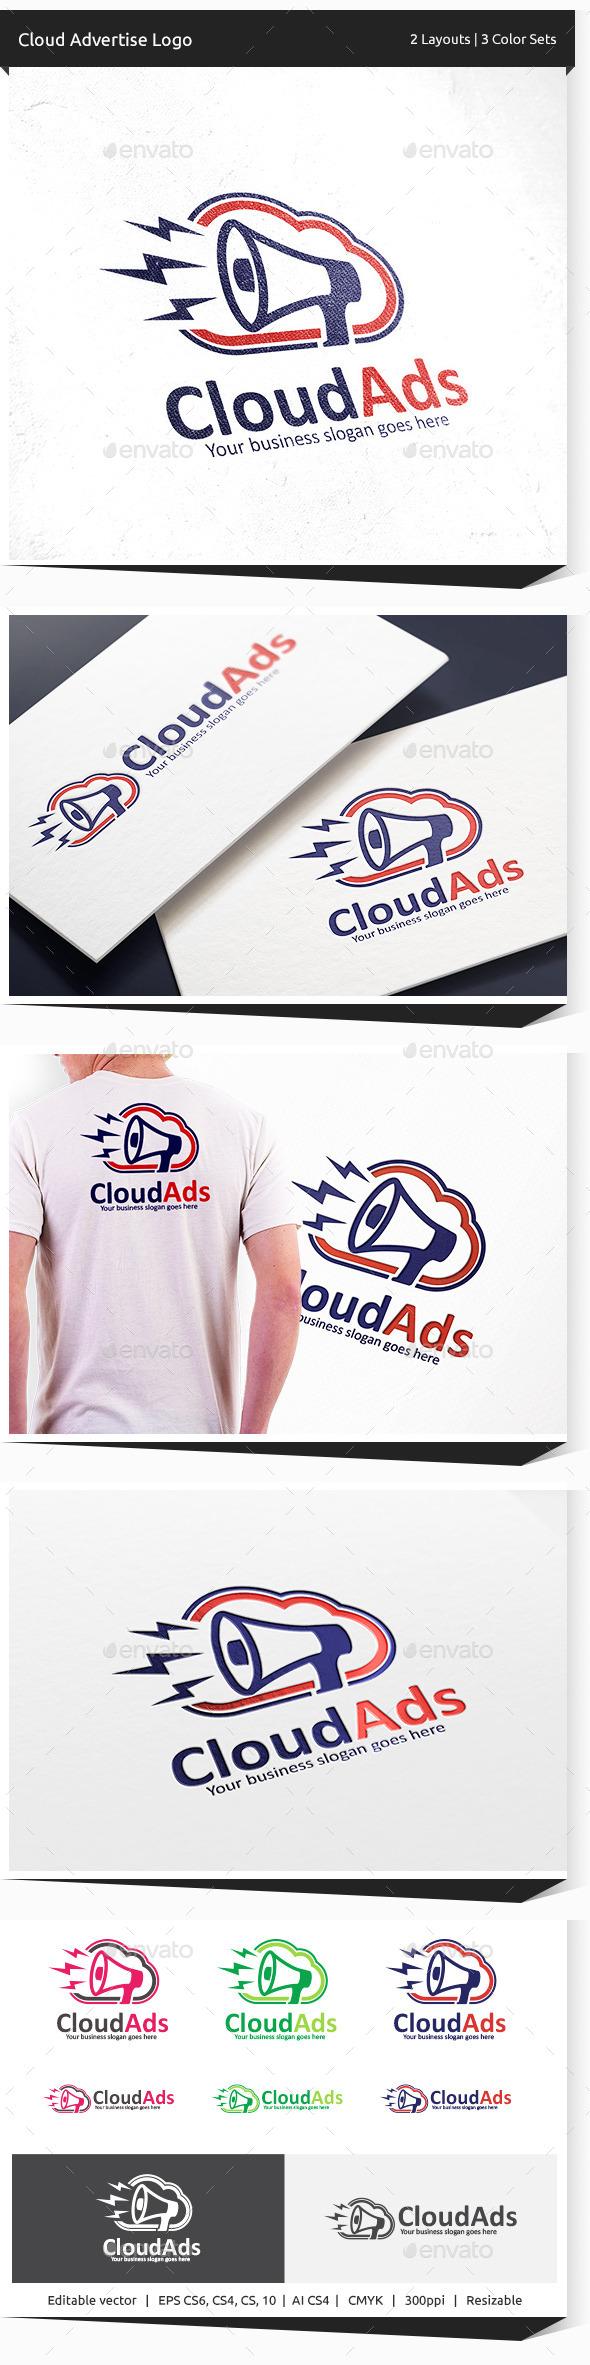 Cloud Advert Logo - Objects Logo Templates